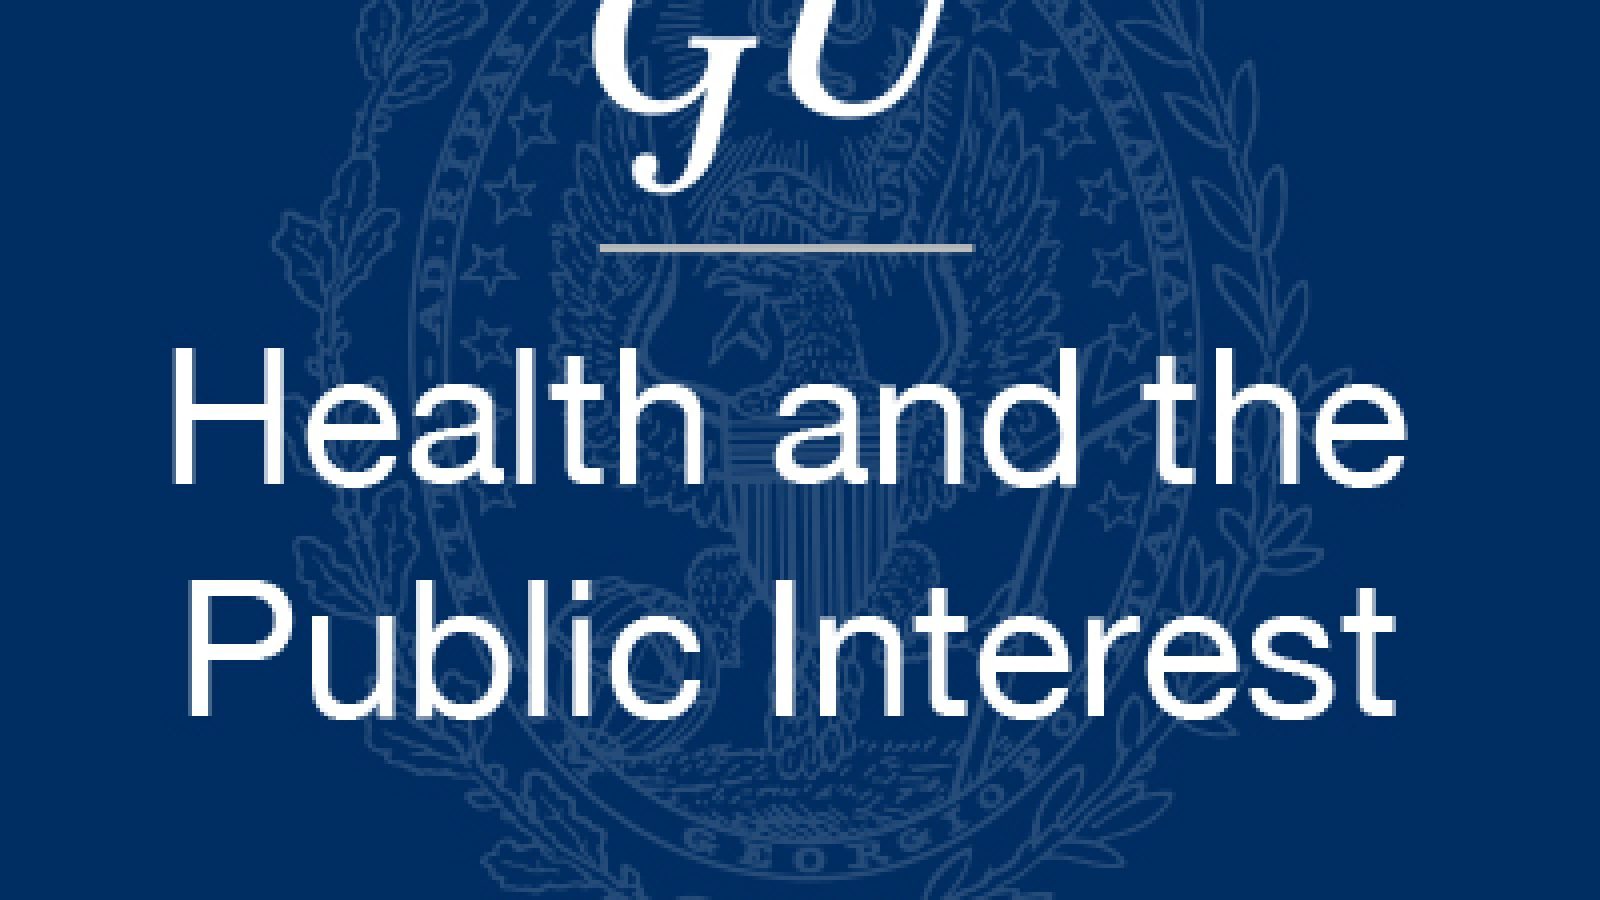 M.S. Health and the Public Interest social media logo